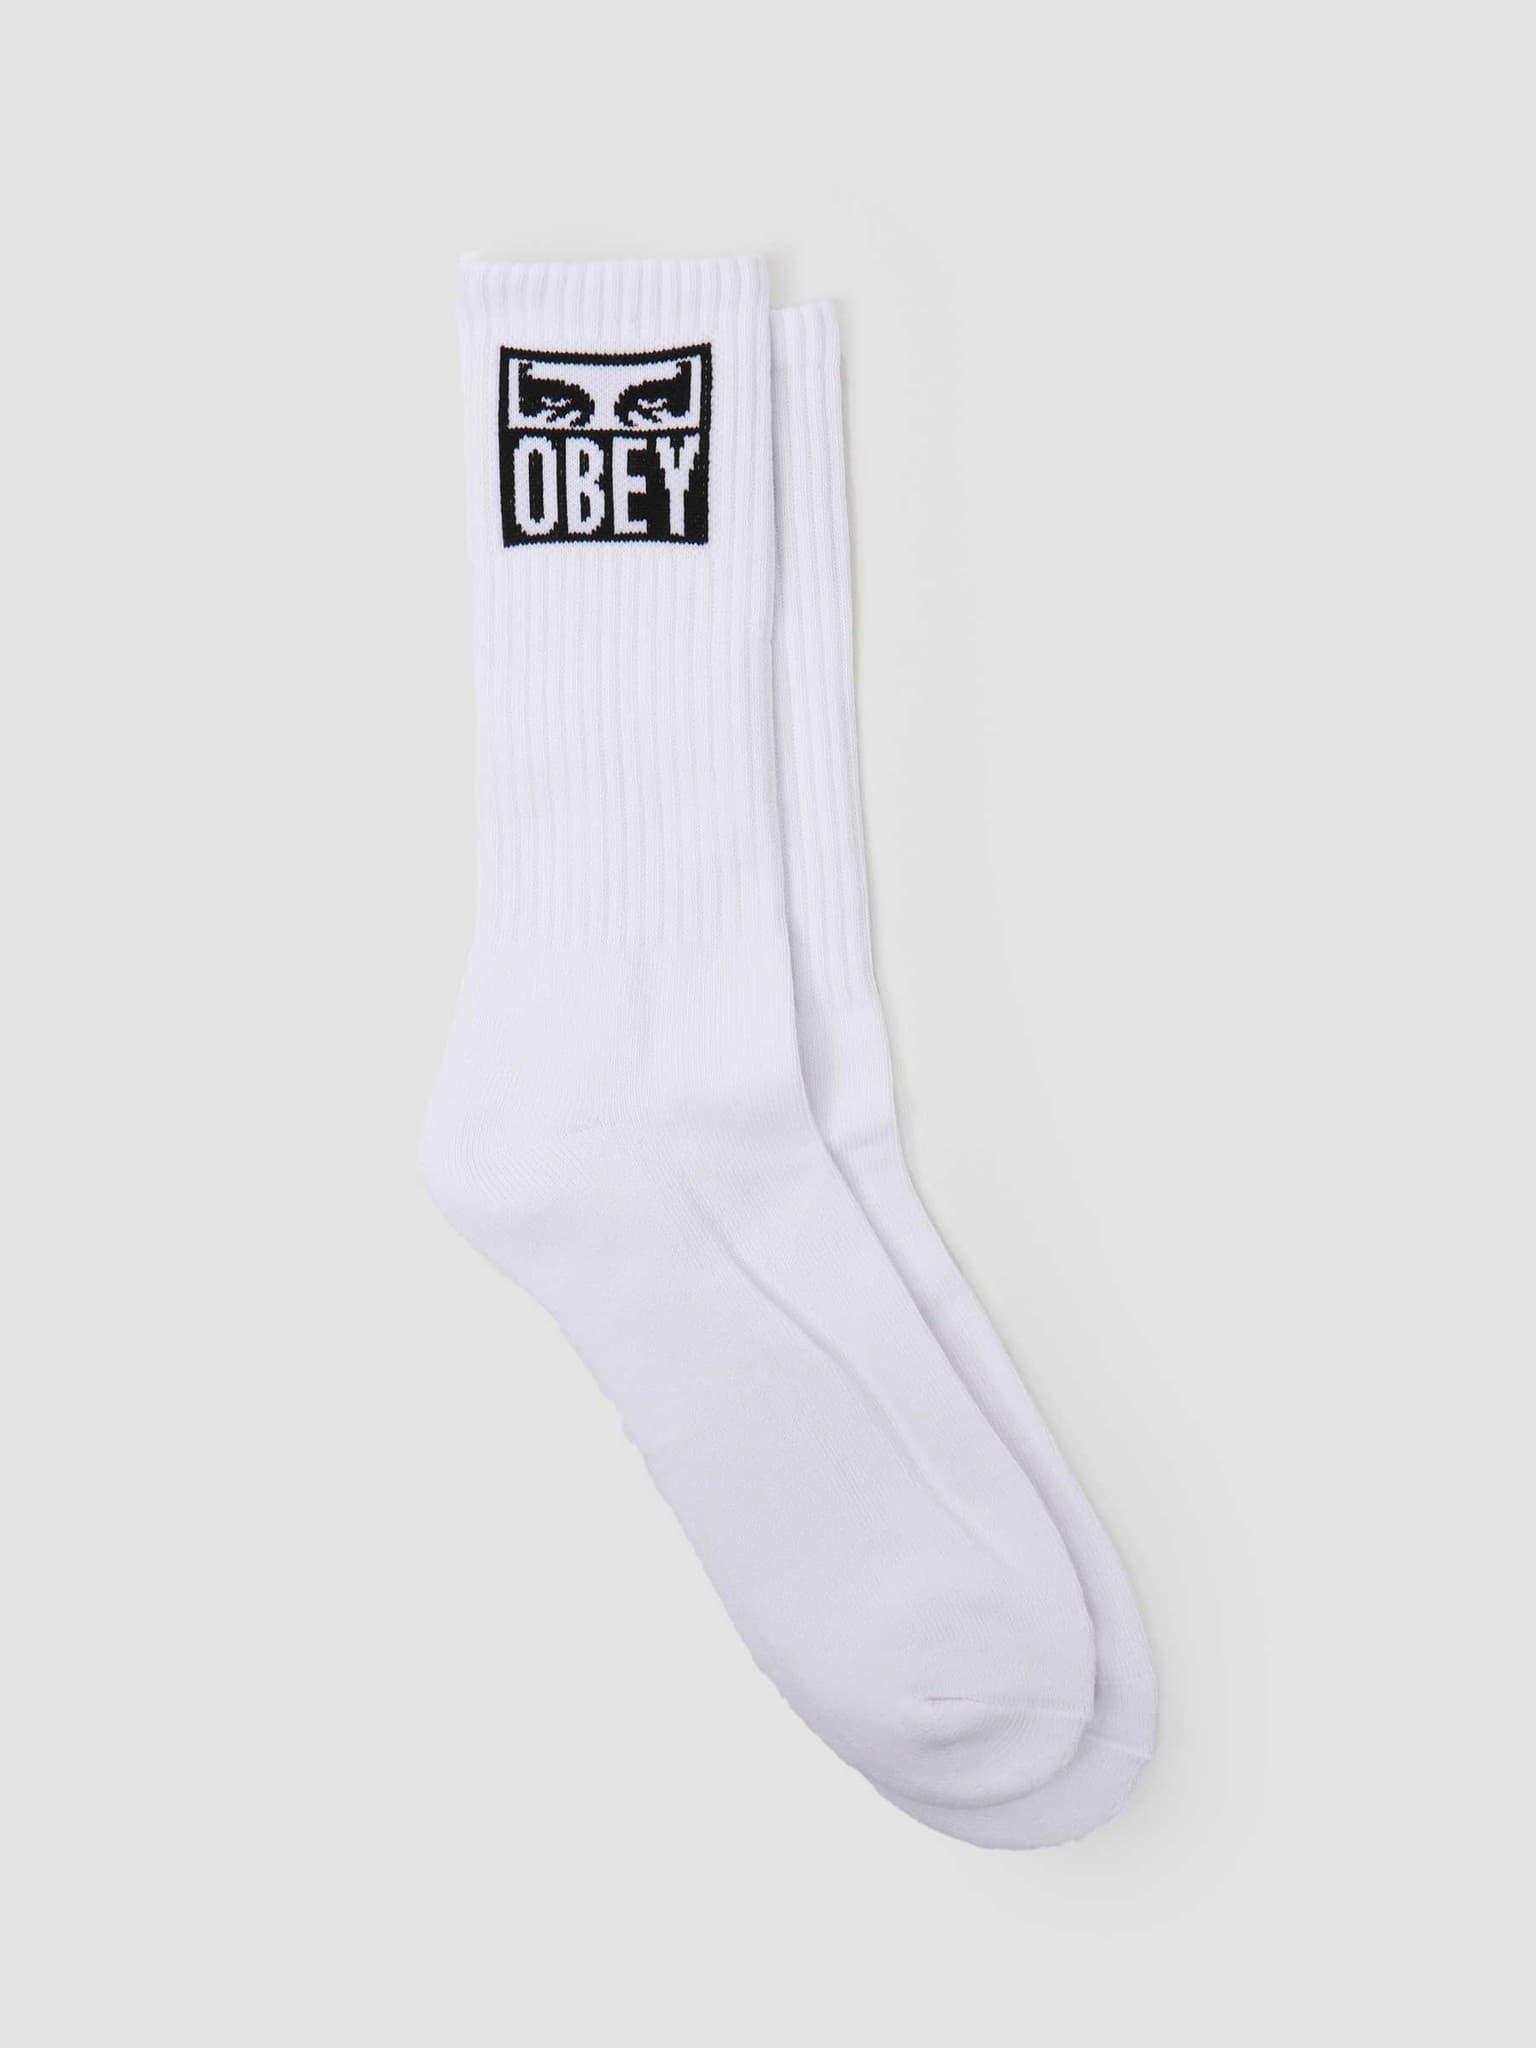 Obey eyes icon socks White 100260141 WHT